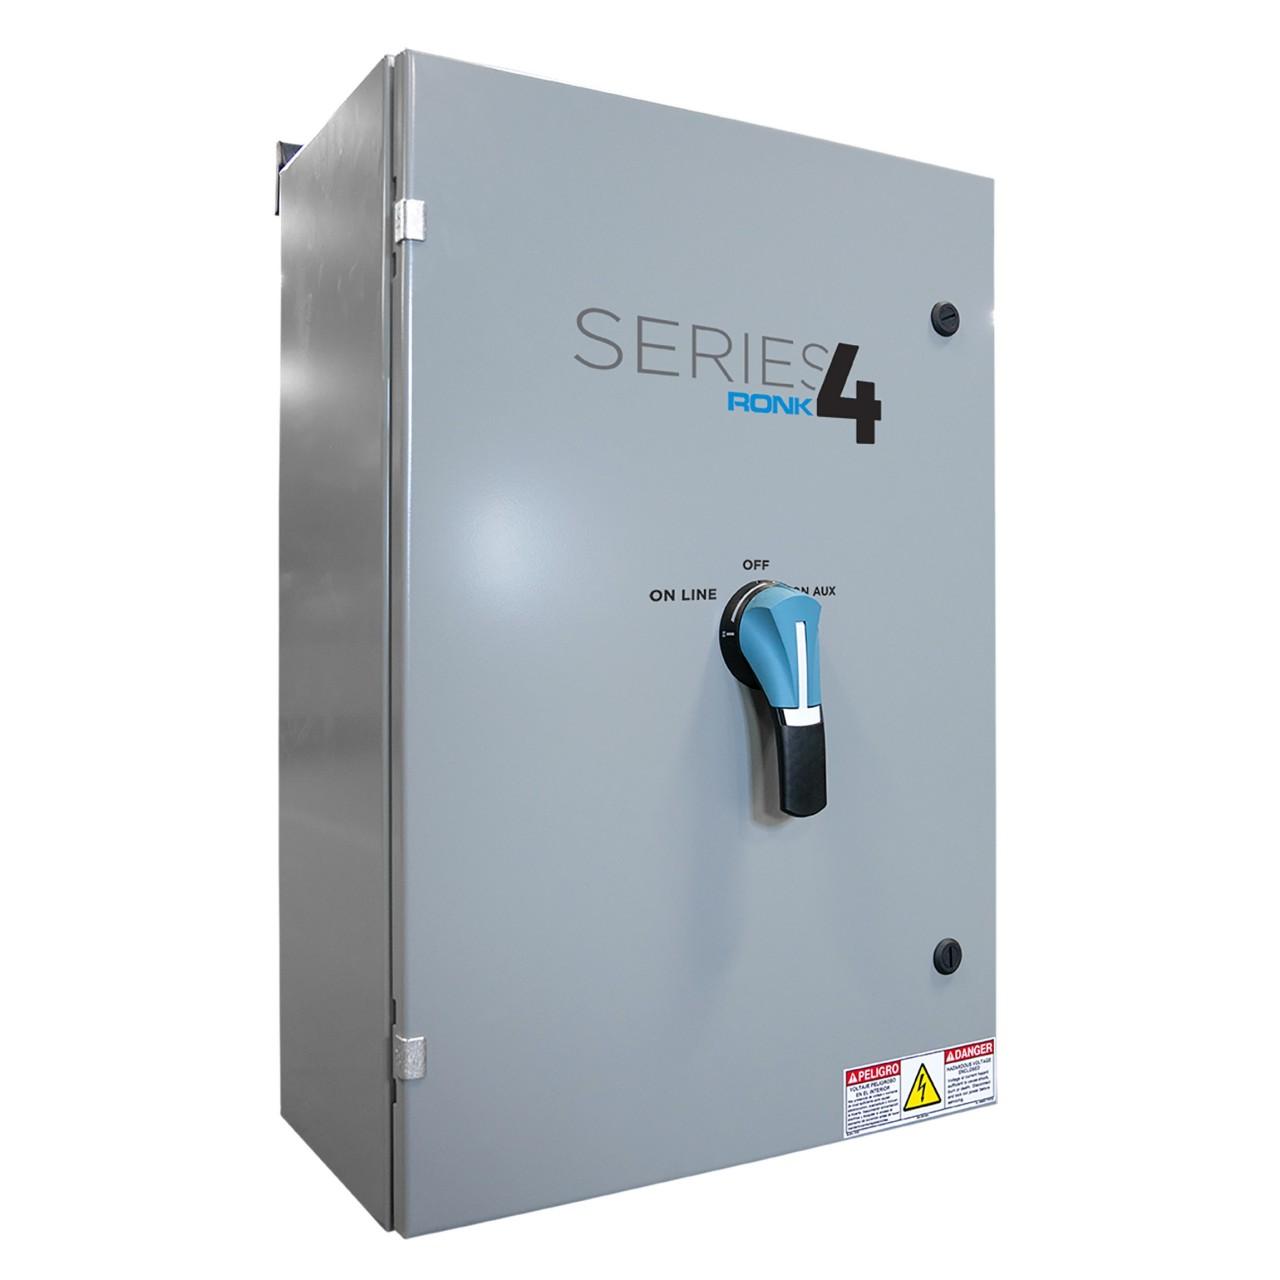 Ronk 4604 Transfer Switch (3Ph, 4-Pole, 600A)